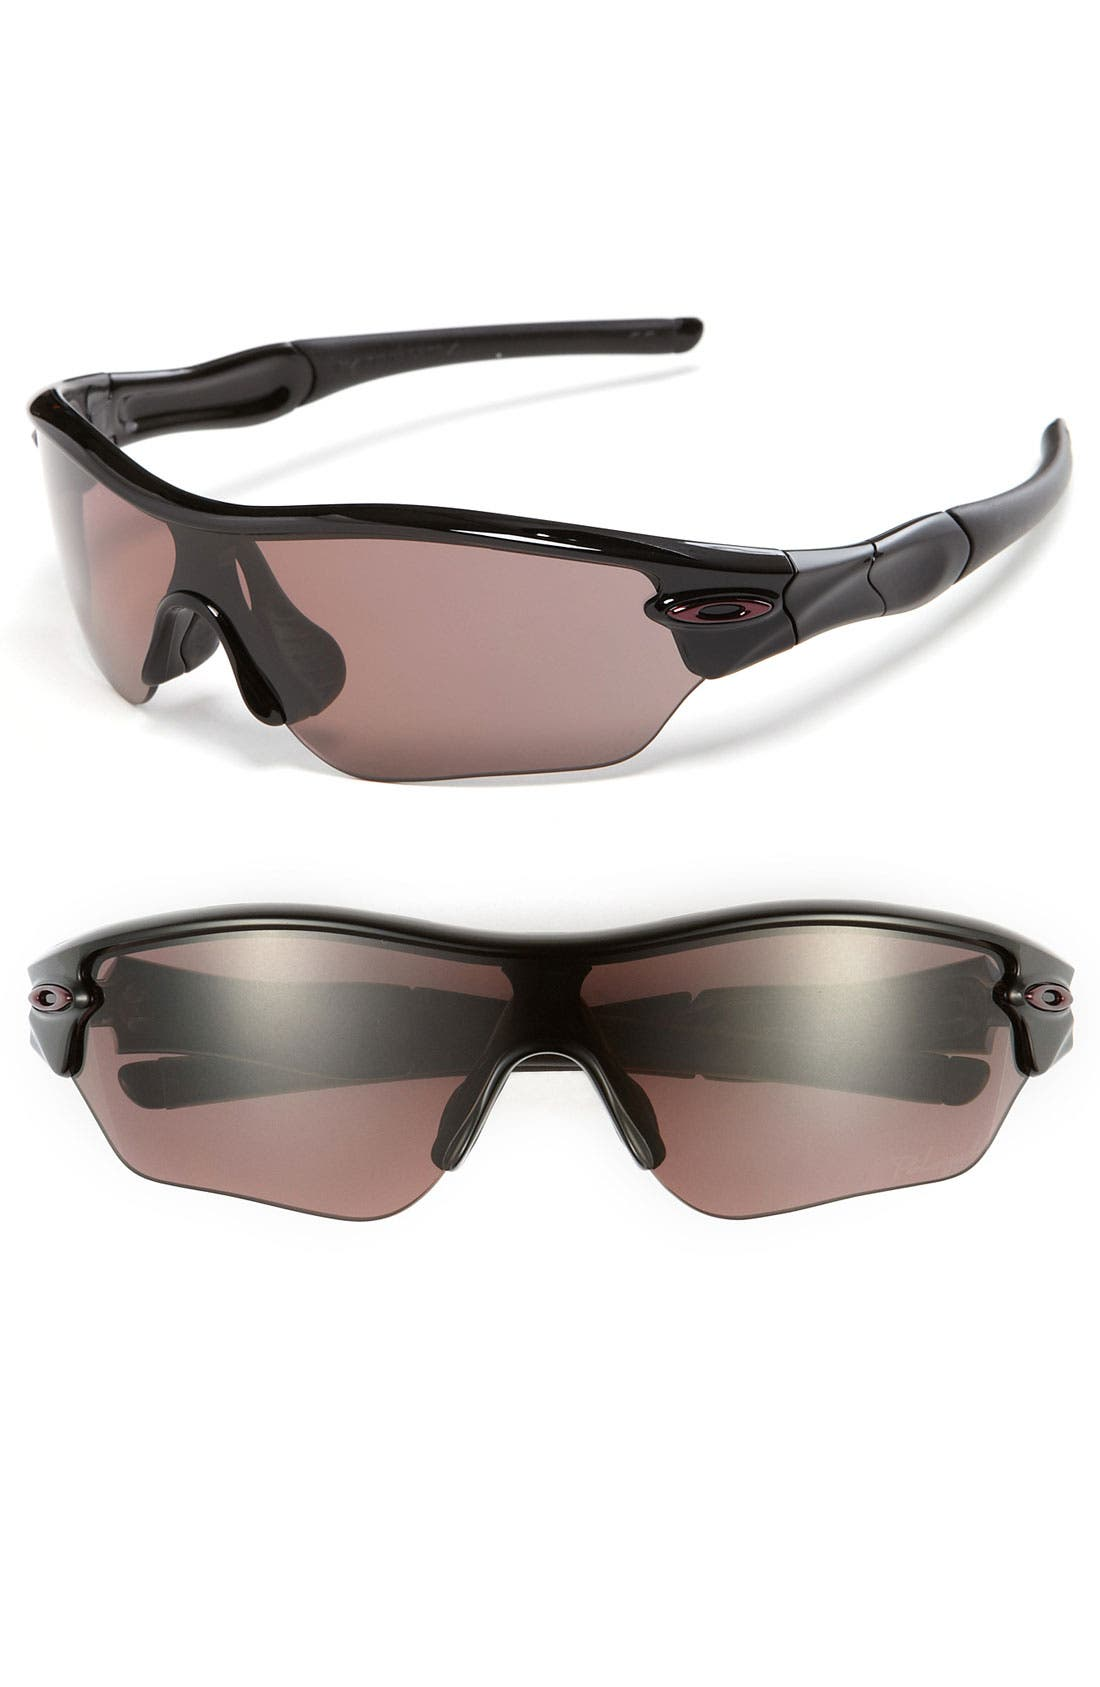 Main Image - Oakley 'Radar® Edge™' 135mm Polarized Sunglasses